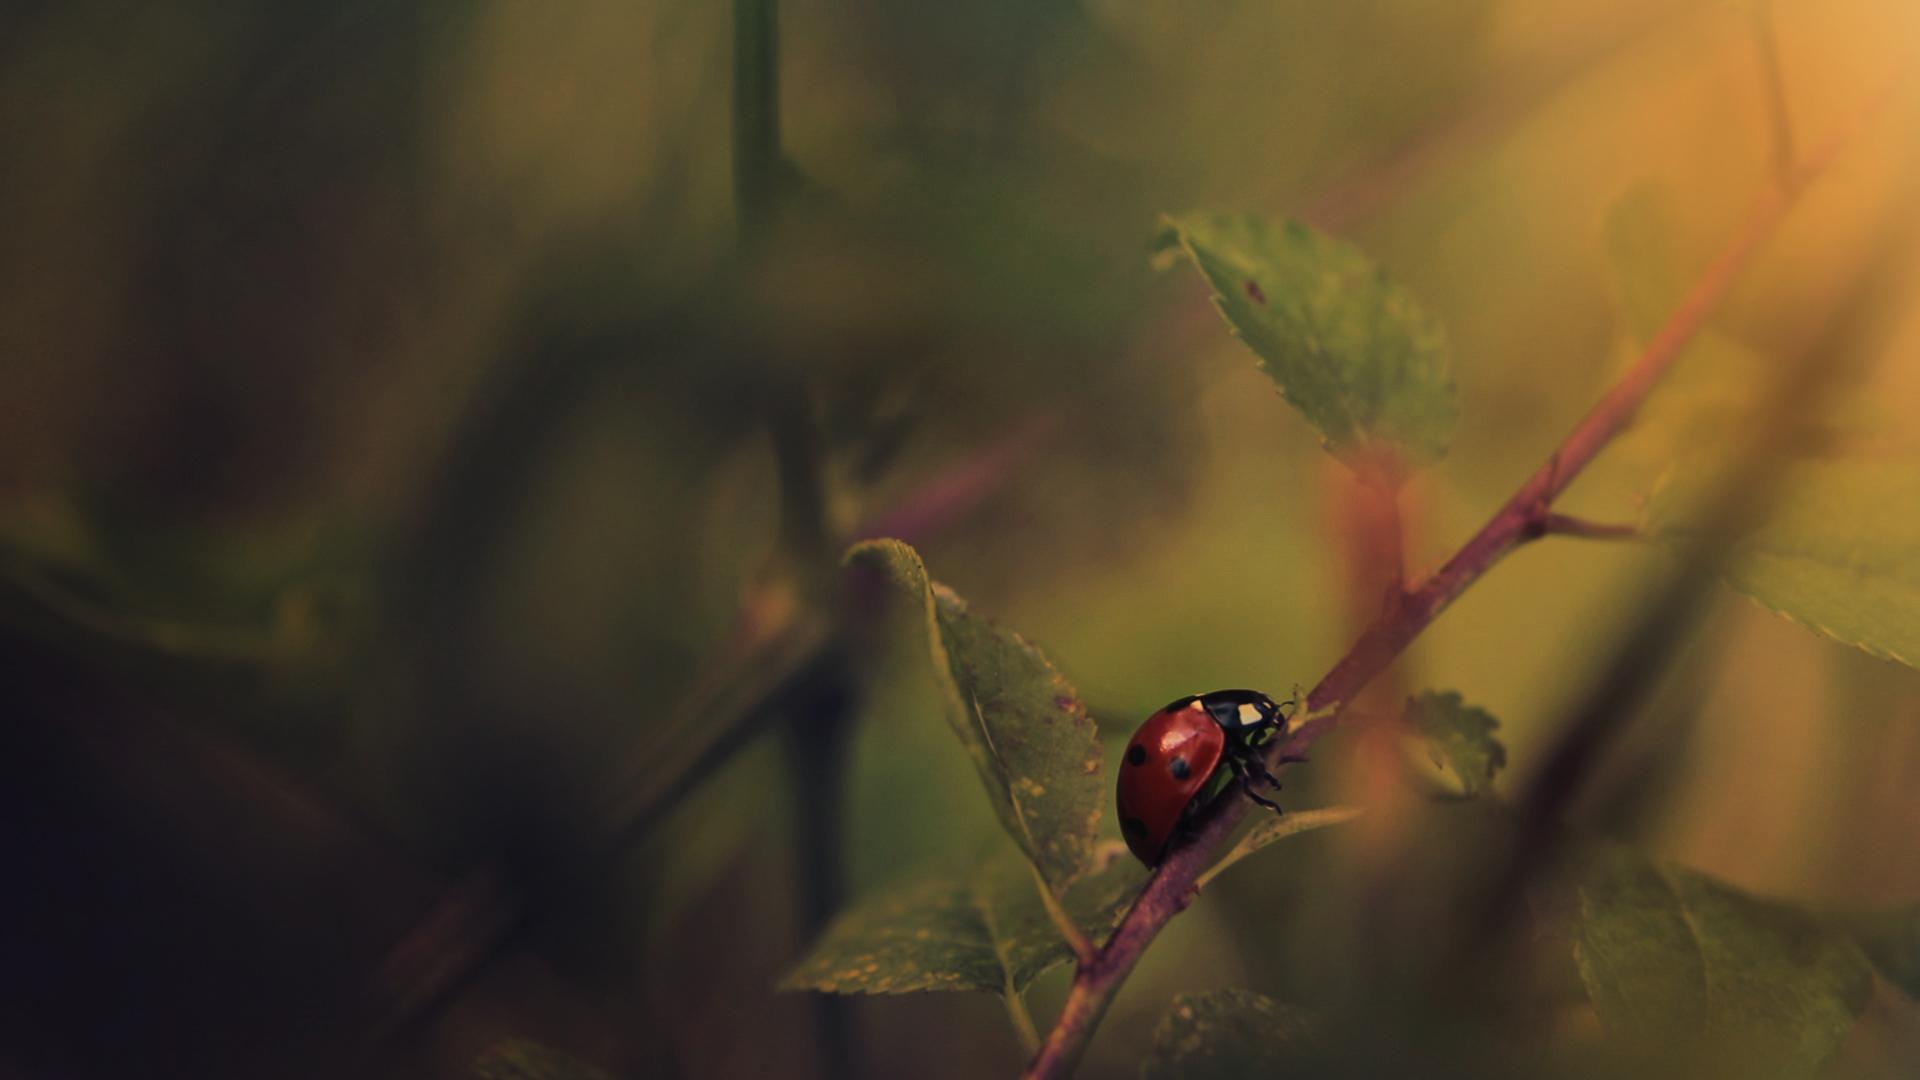 Светлината към живота   Author Miroslav Georgiev - M.Georgiev   PHOTO FORUM